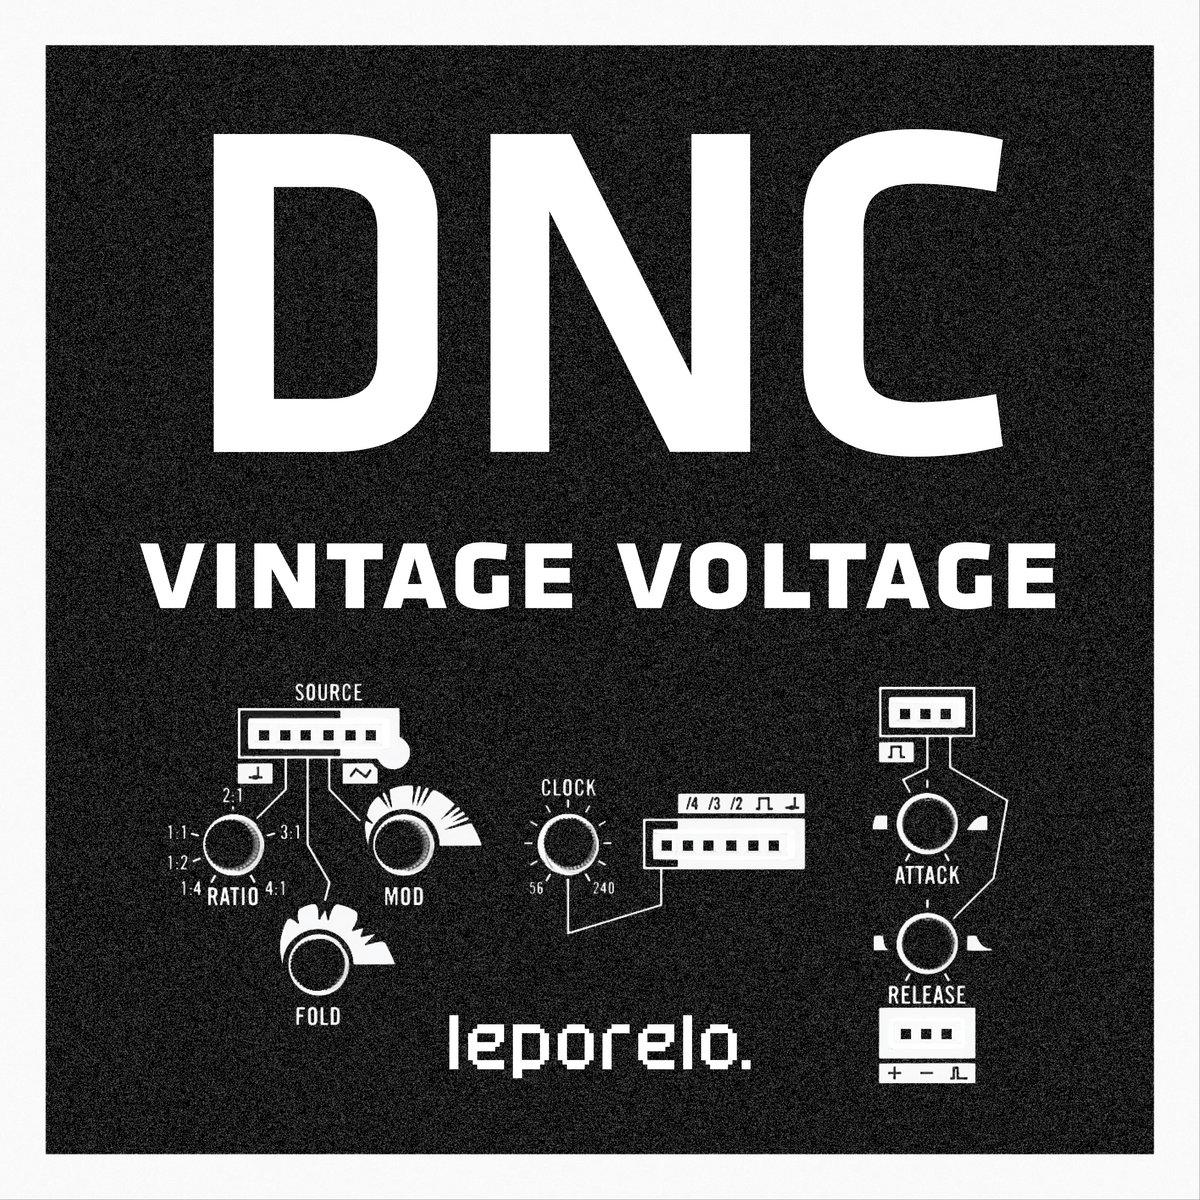 Vintage Voltage TV Guide from RadioTimes